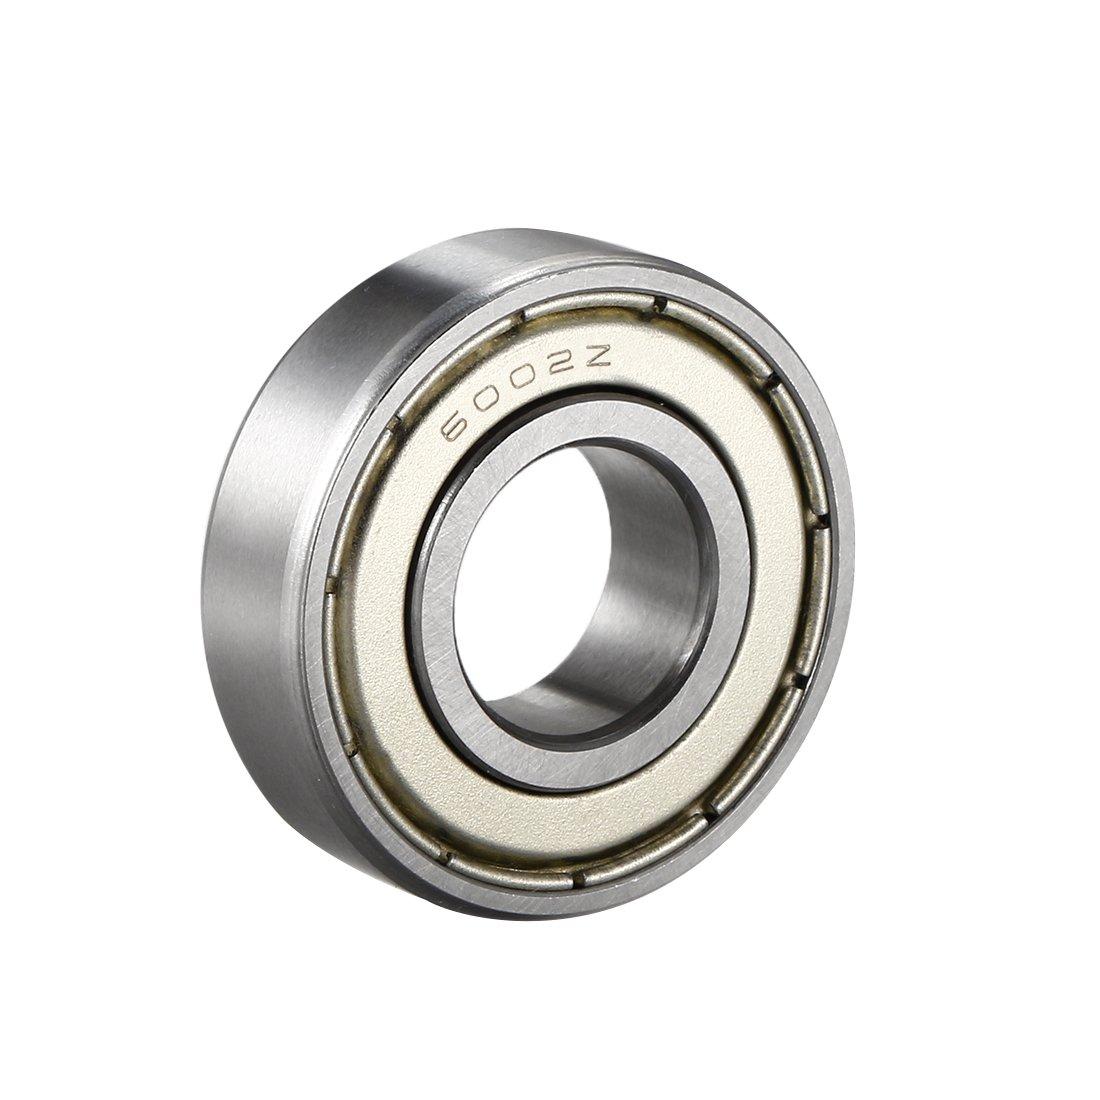 uxcell 6002ZZ Deep Groove Ball Bearing Double Shield 6002-2Z 80102, 15mm x 32mm x 9mm Chrome Steel Bearings (1-Pack)